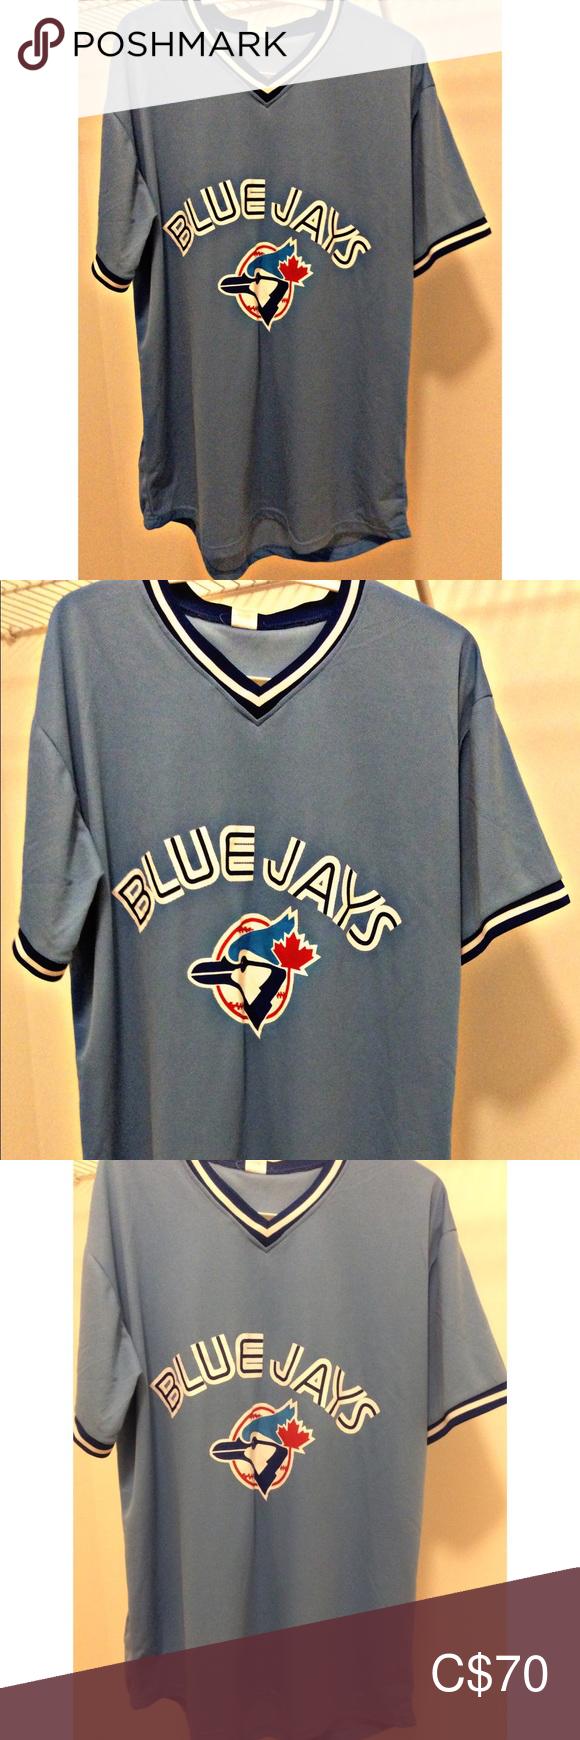 Retro Toronto Blue Jays Powder Blue Jersey Xl Mlb Powder Blue Color Toronto Blue Jays Mens Tops